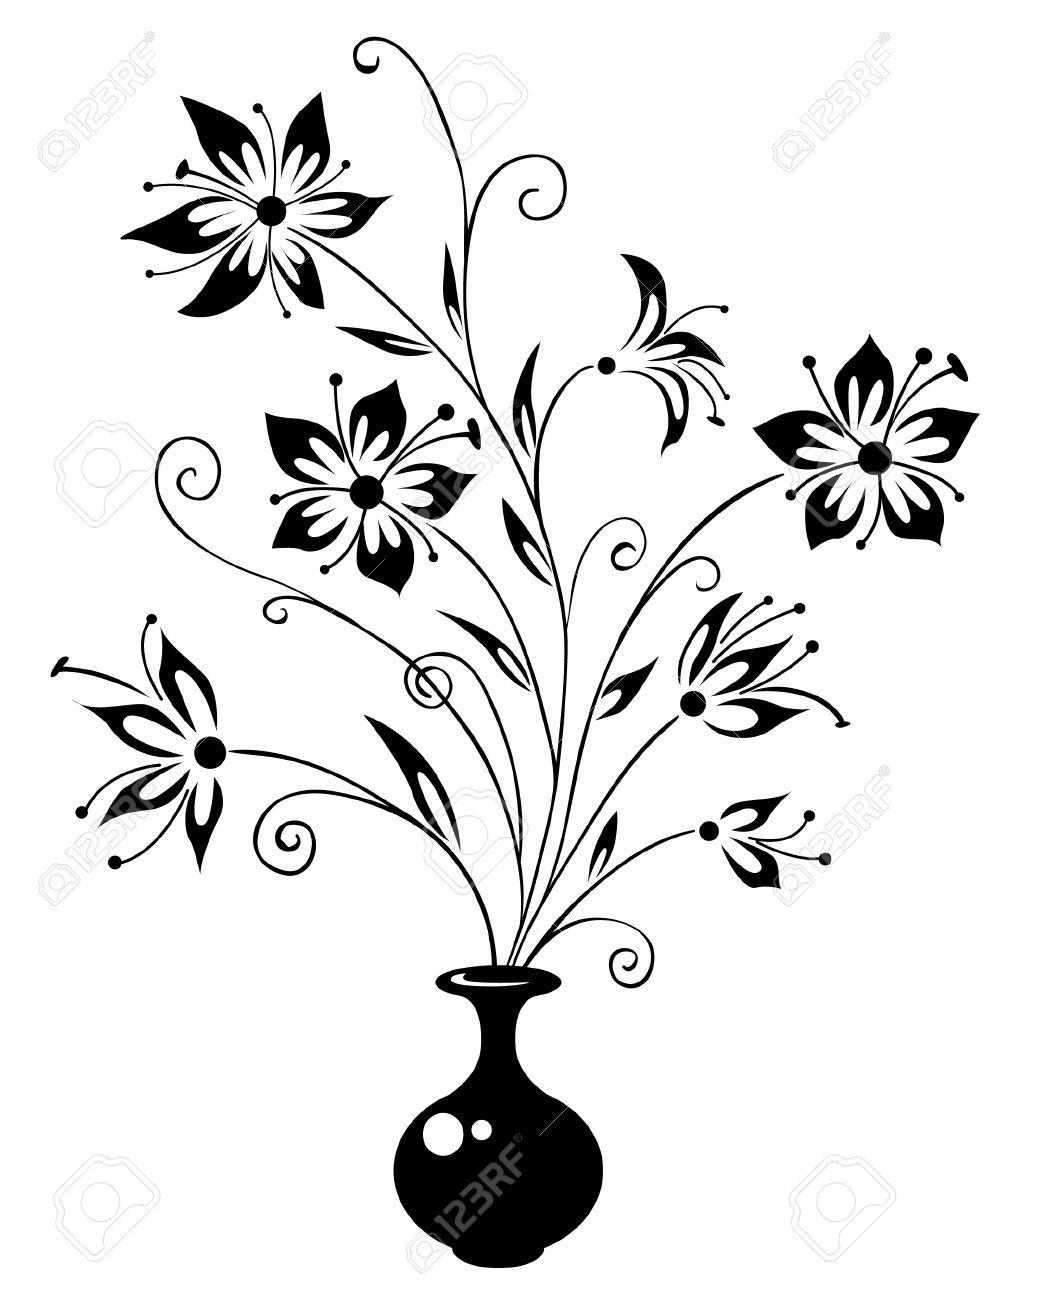 1040x1300 Pencil Drawing Flower Vase Pencil Drawing Flower Vase Glass Vase